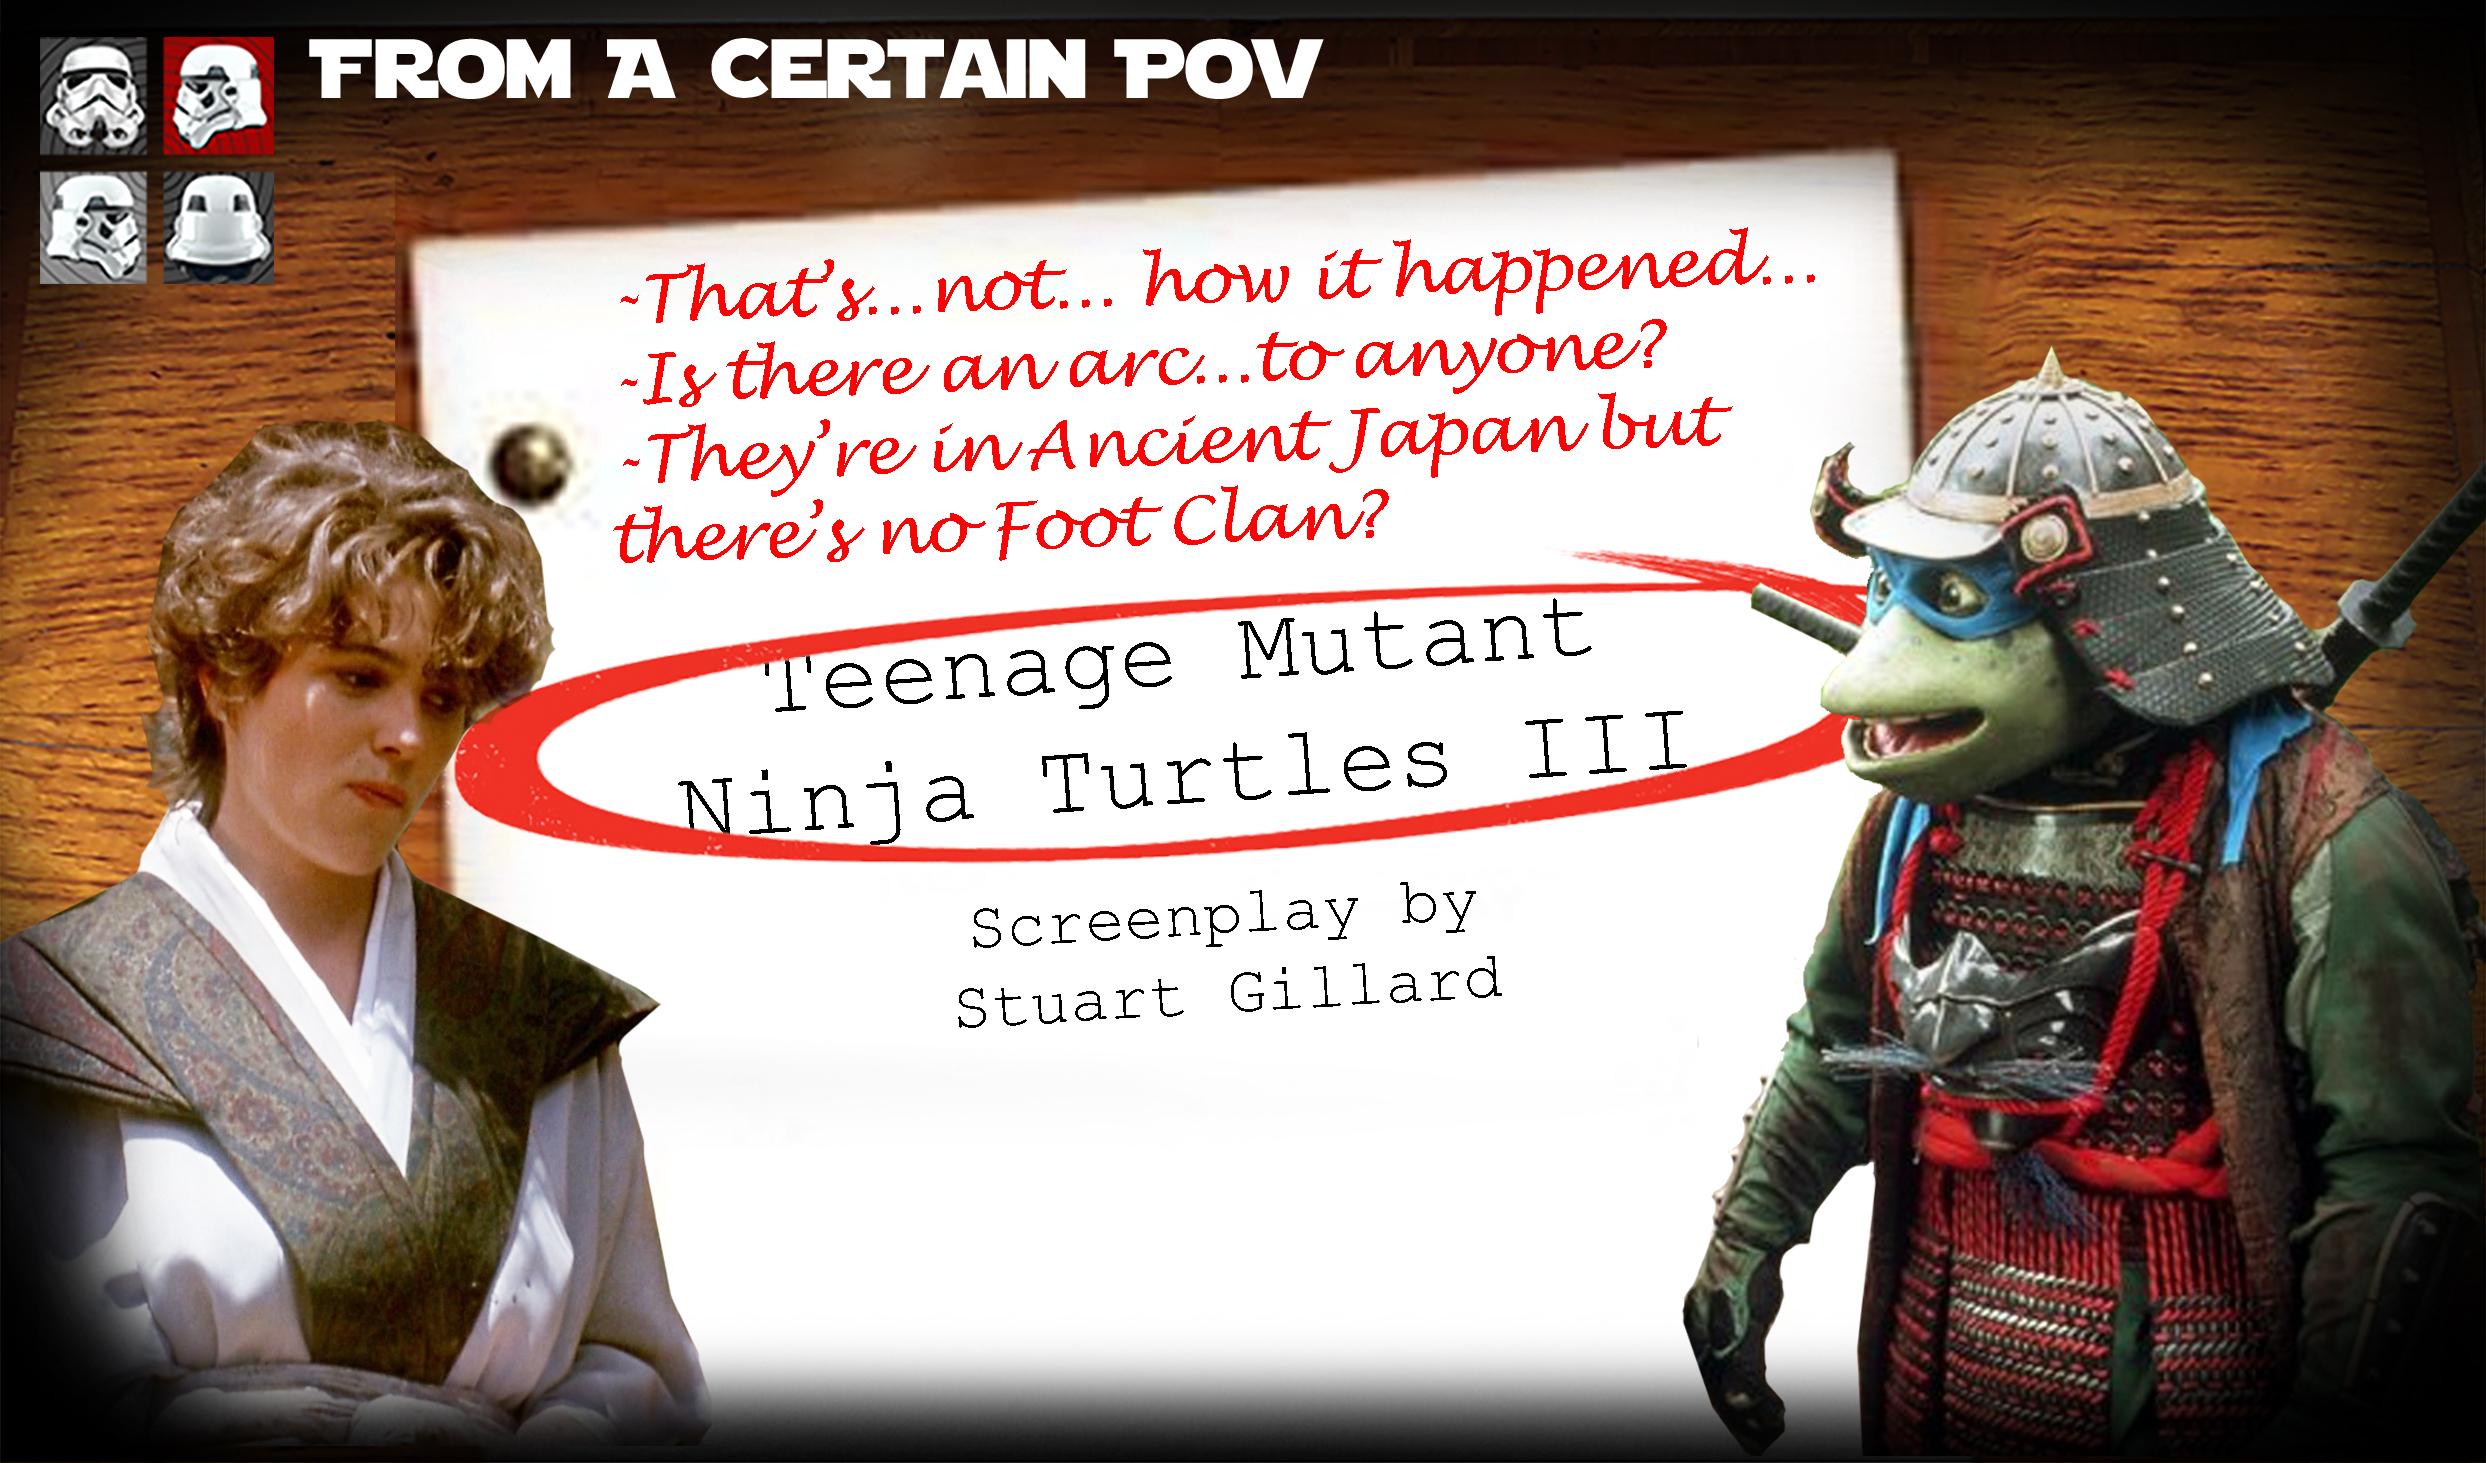 11 - Another Pass on Teenage Mutant Ninja Turtles 3 Banner.jpg